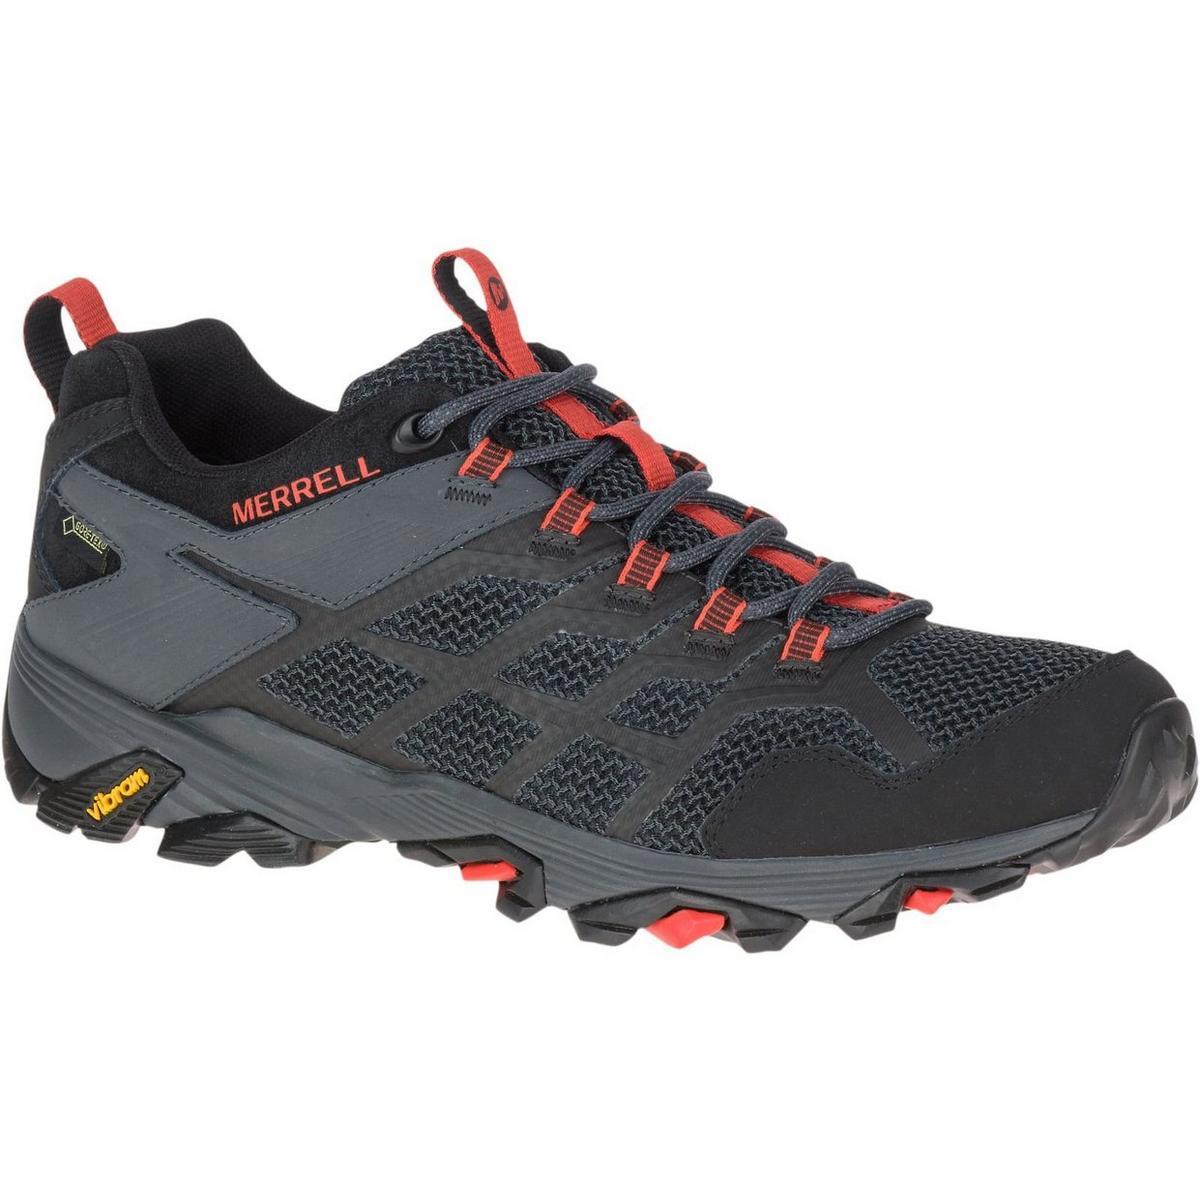 Merrell Men's Moab FST 2 Gore-Tex - Black Granite